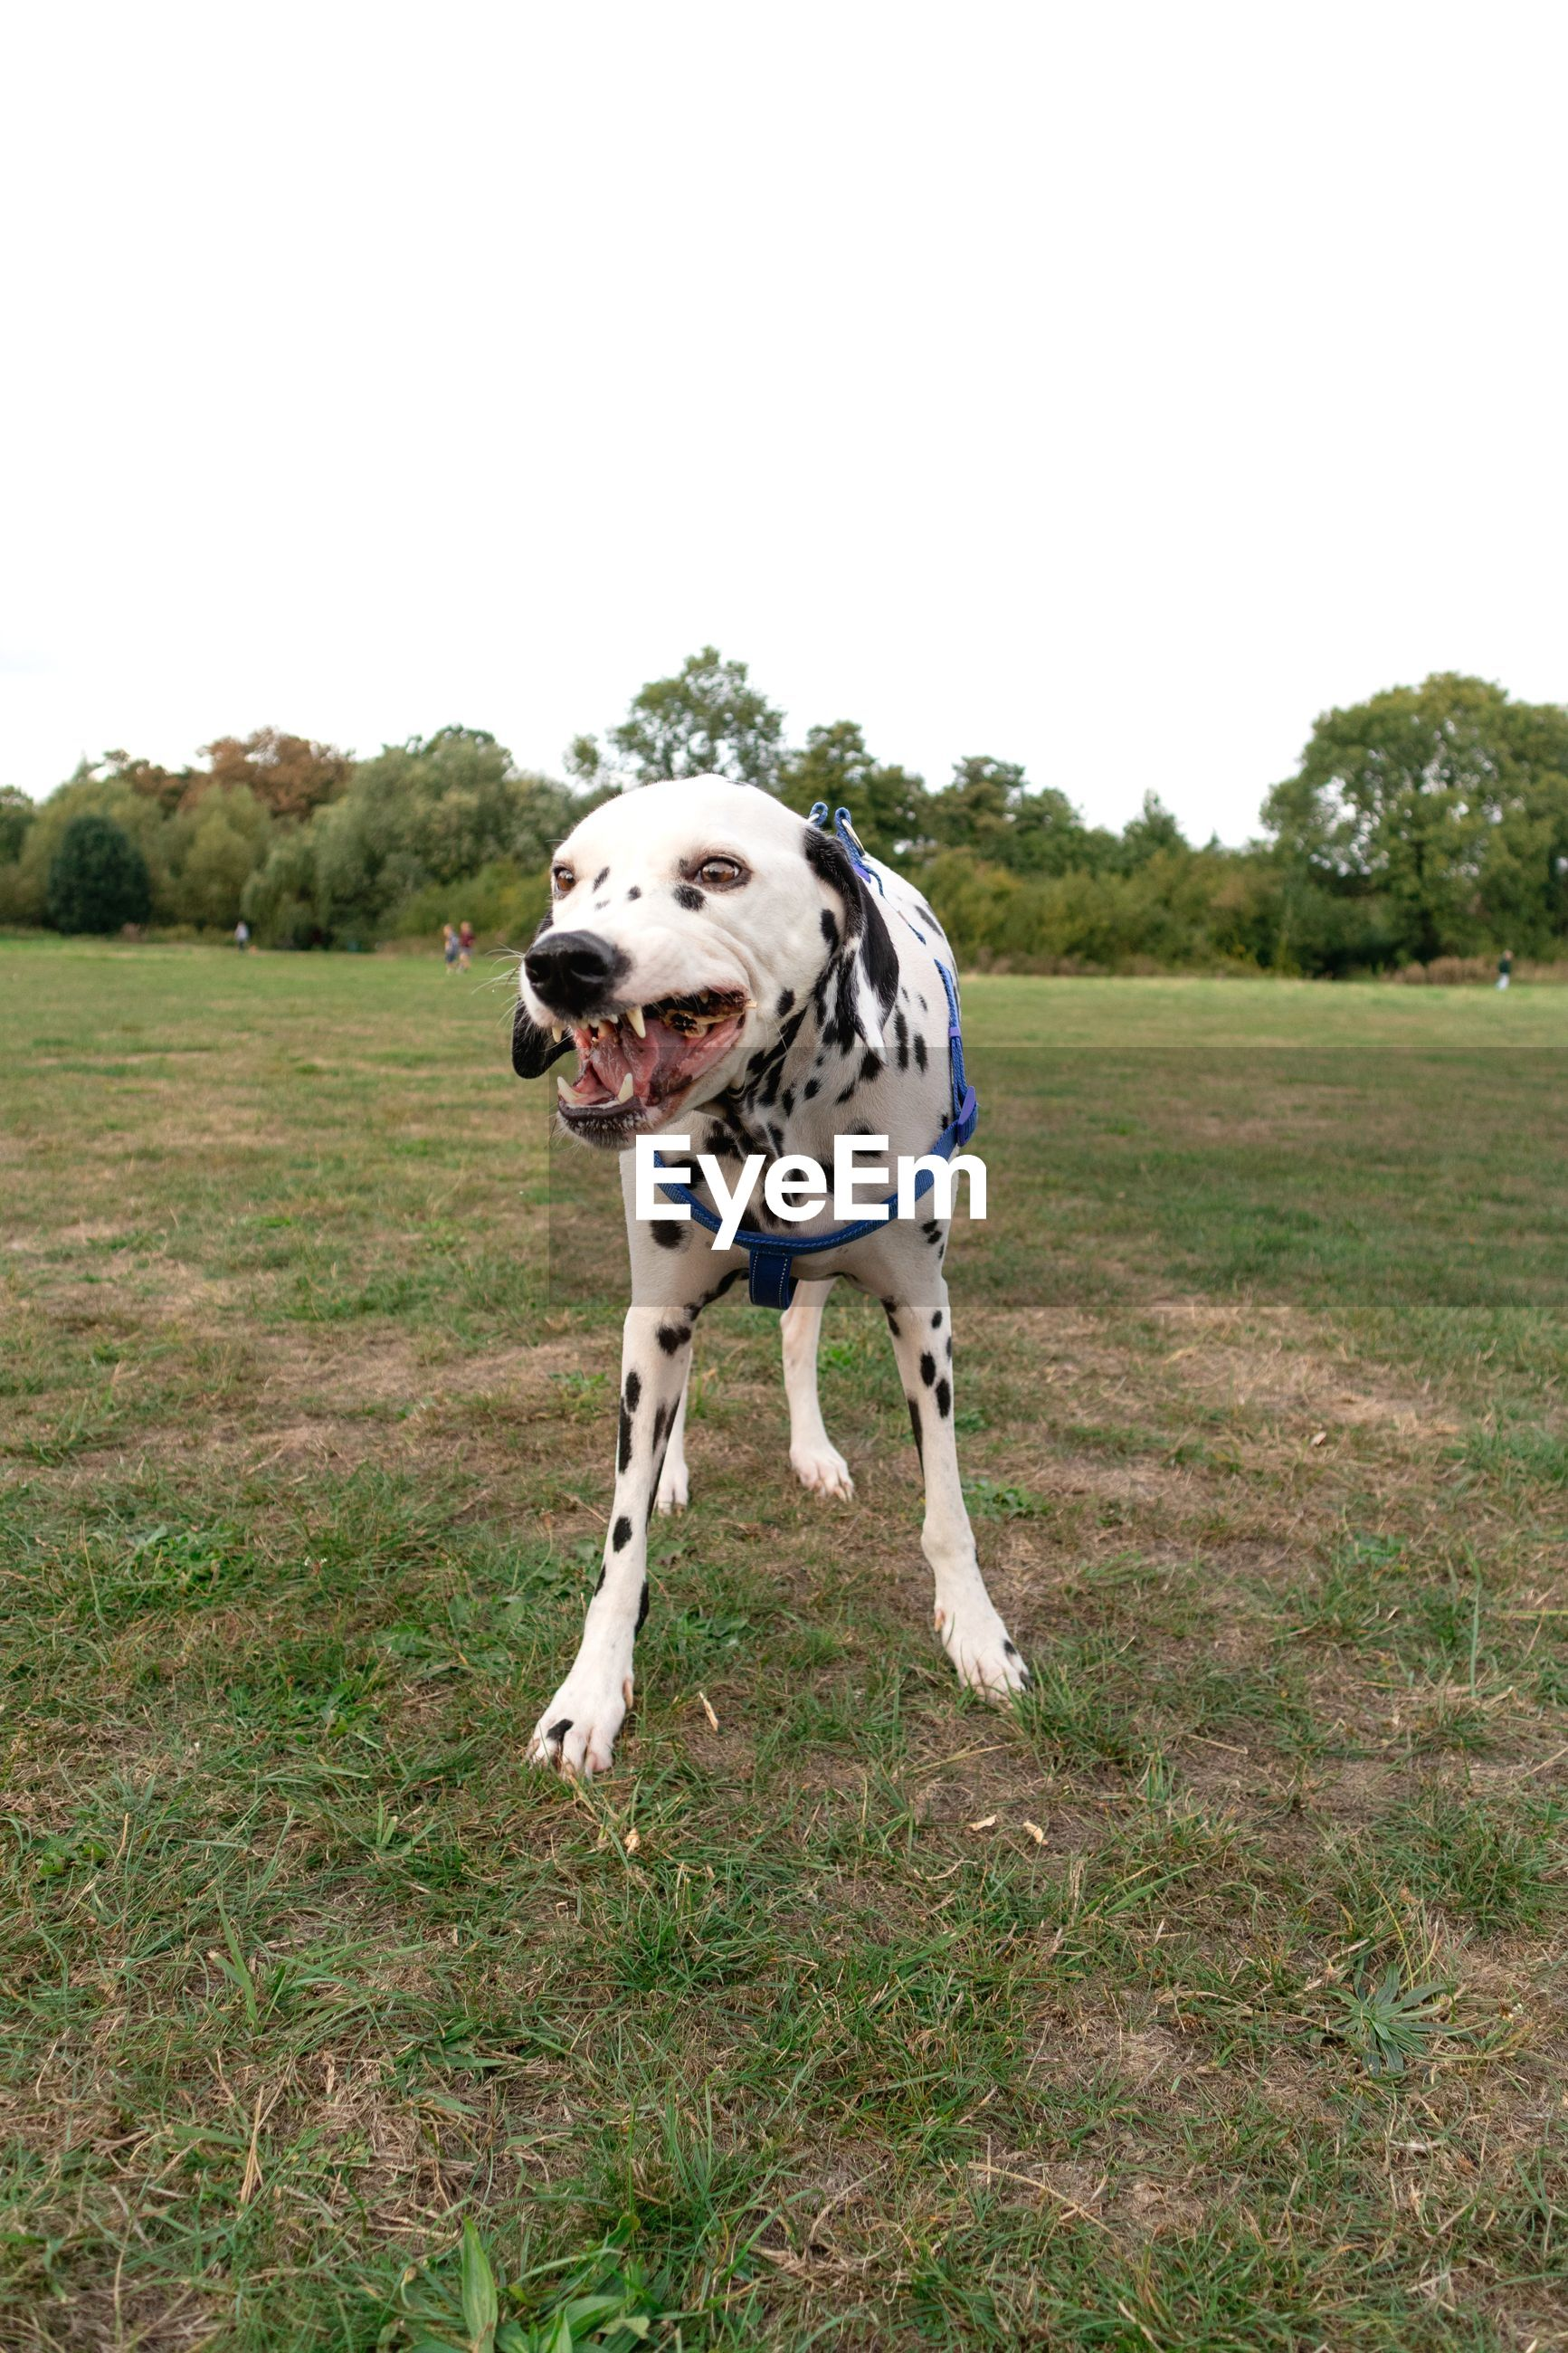 Dalmatian dog standing on field